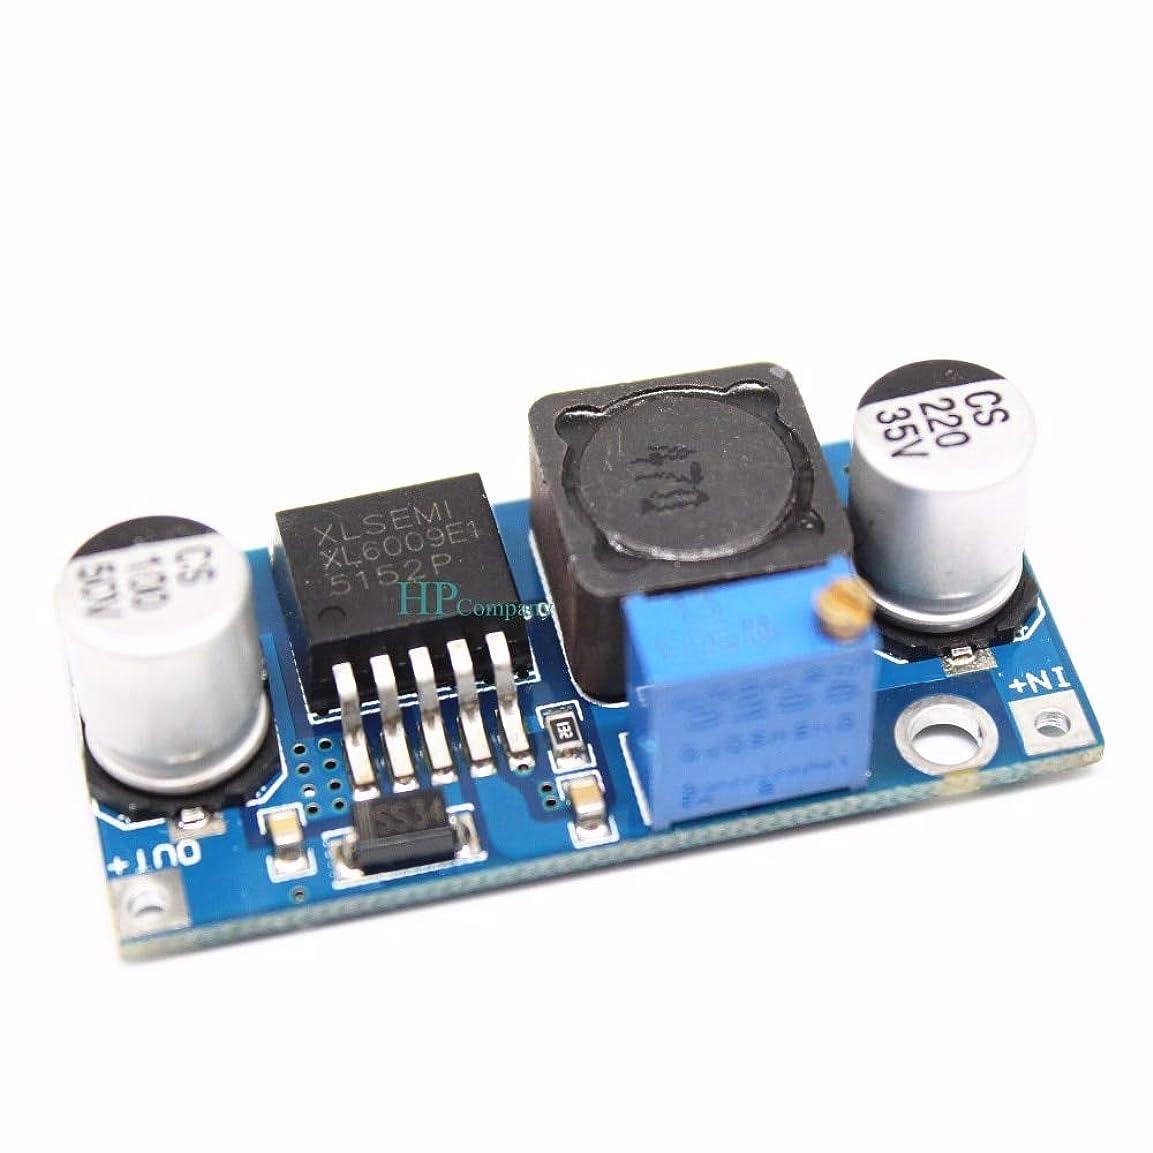 腰予知財政WillBest XL6009 DC-DC Booster module Power supply module output is adjustable Super LM2577 step-up module